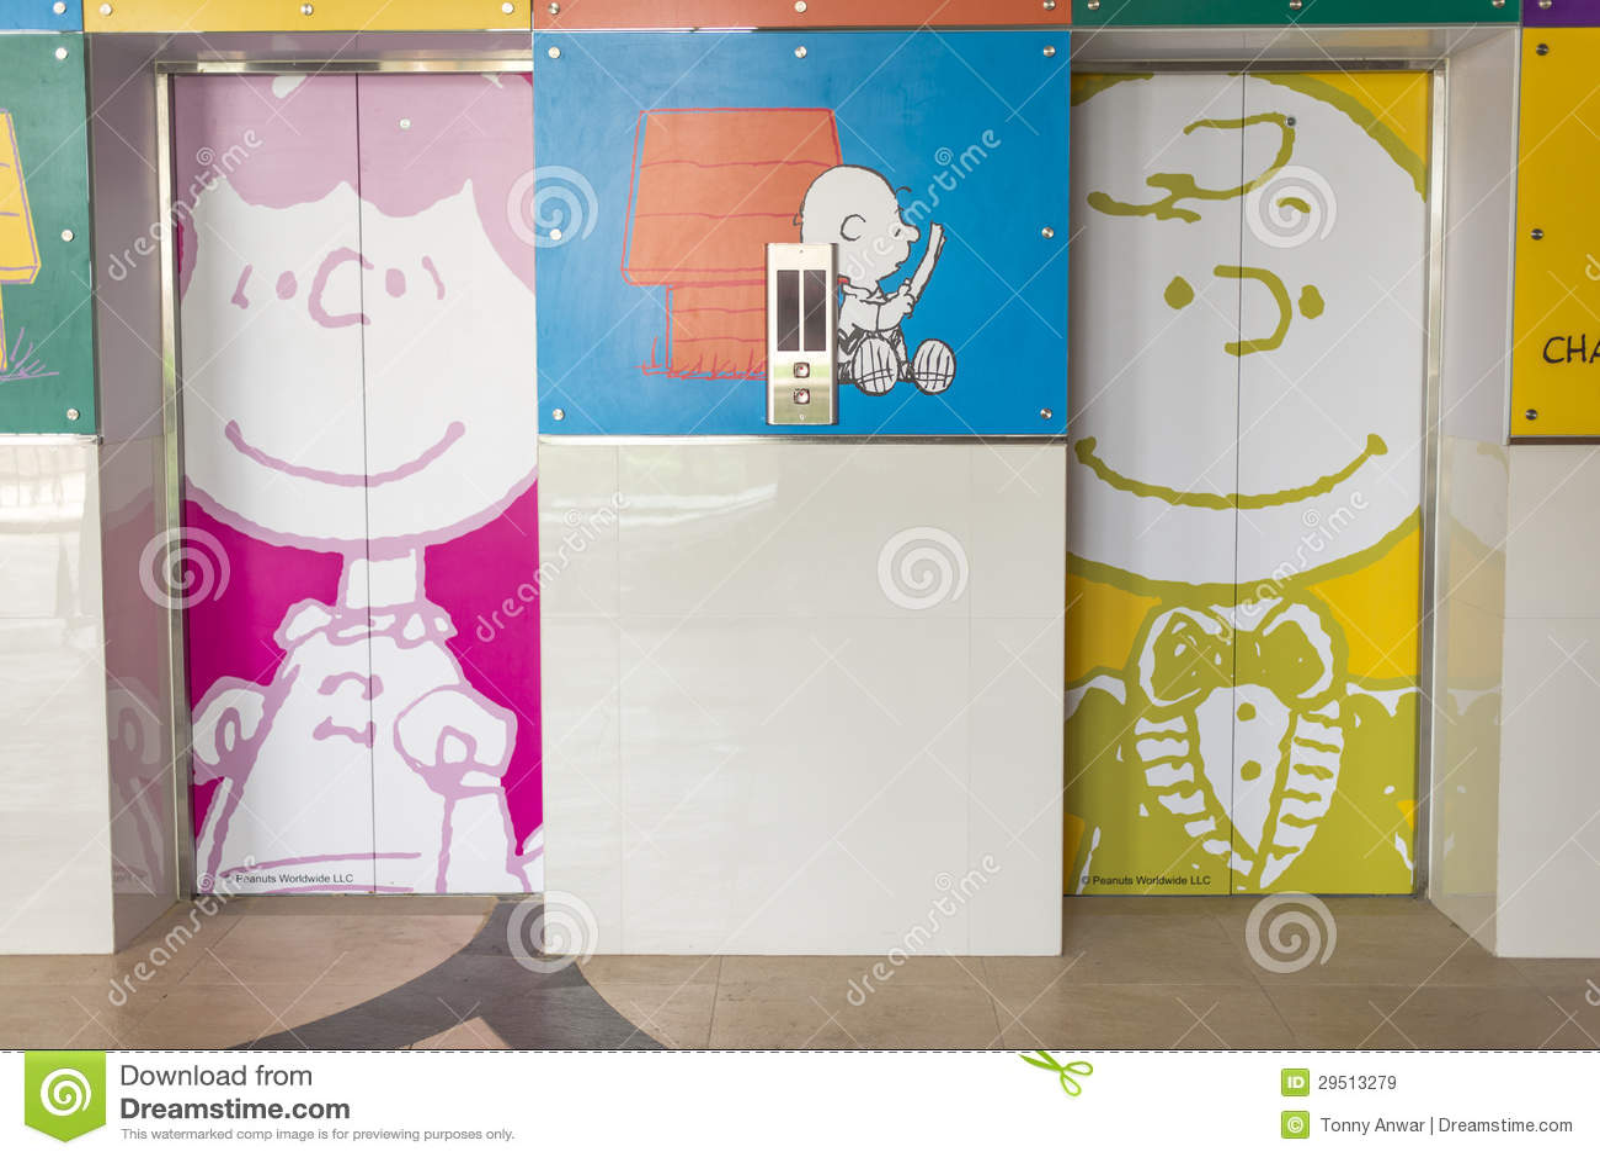 Charlie Brown Lift Lobby